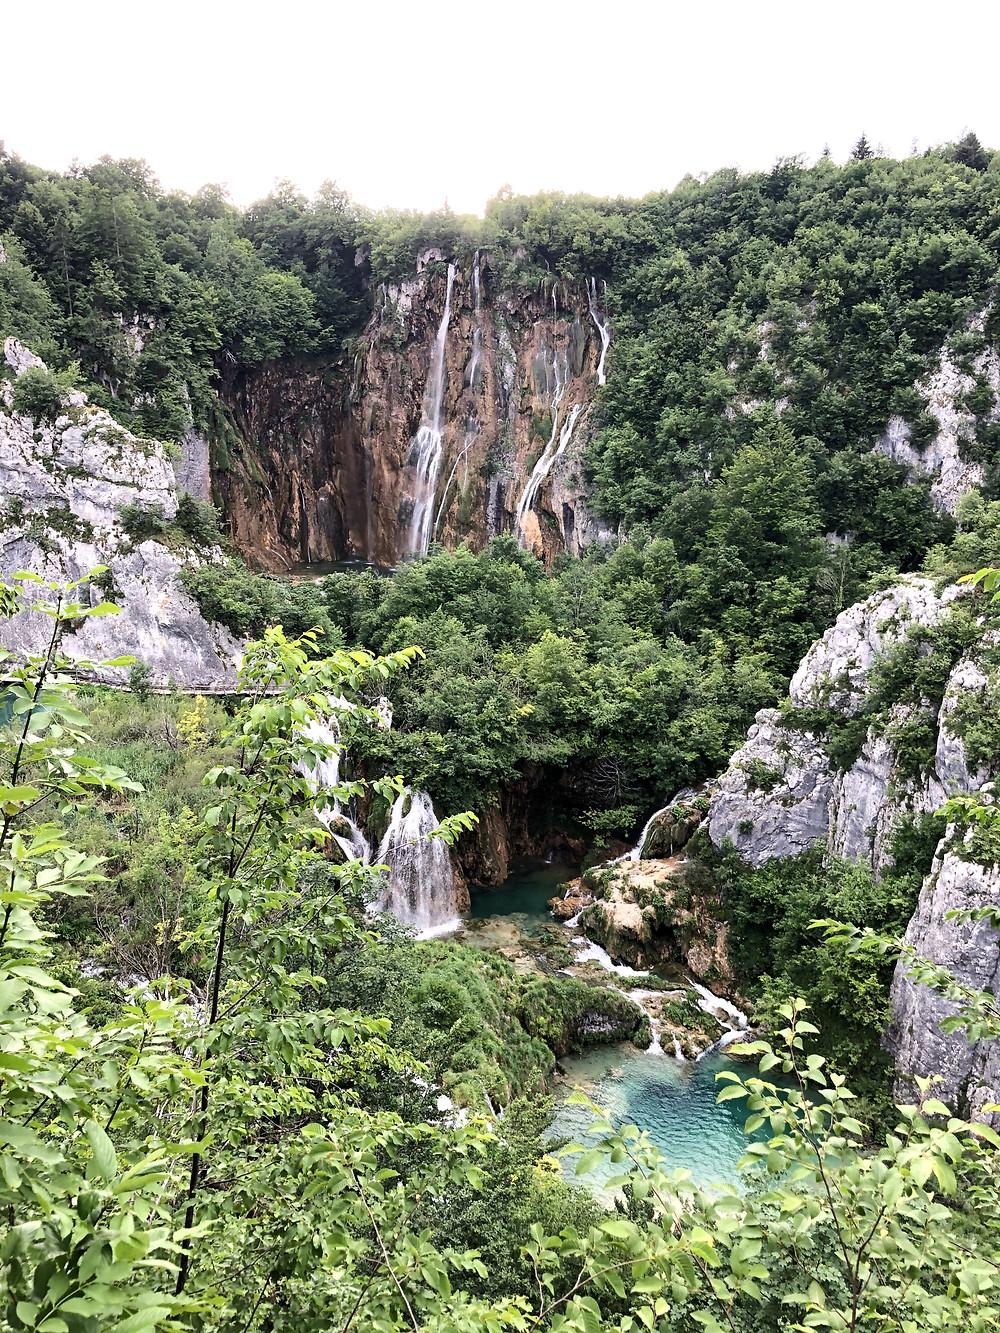 Plitvicer-Seen-Kroatien-urlaub-reisebericht